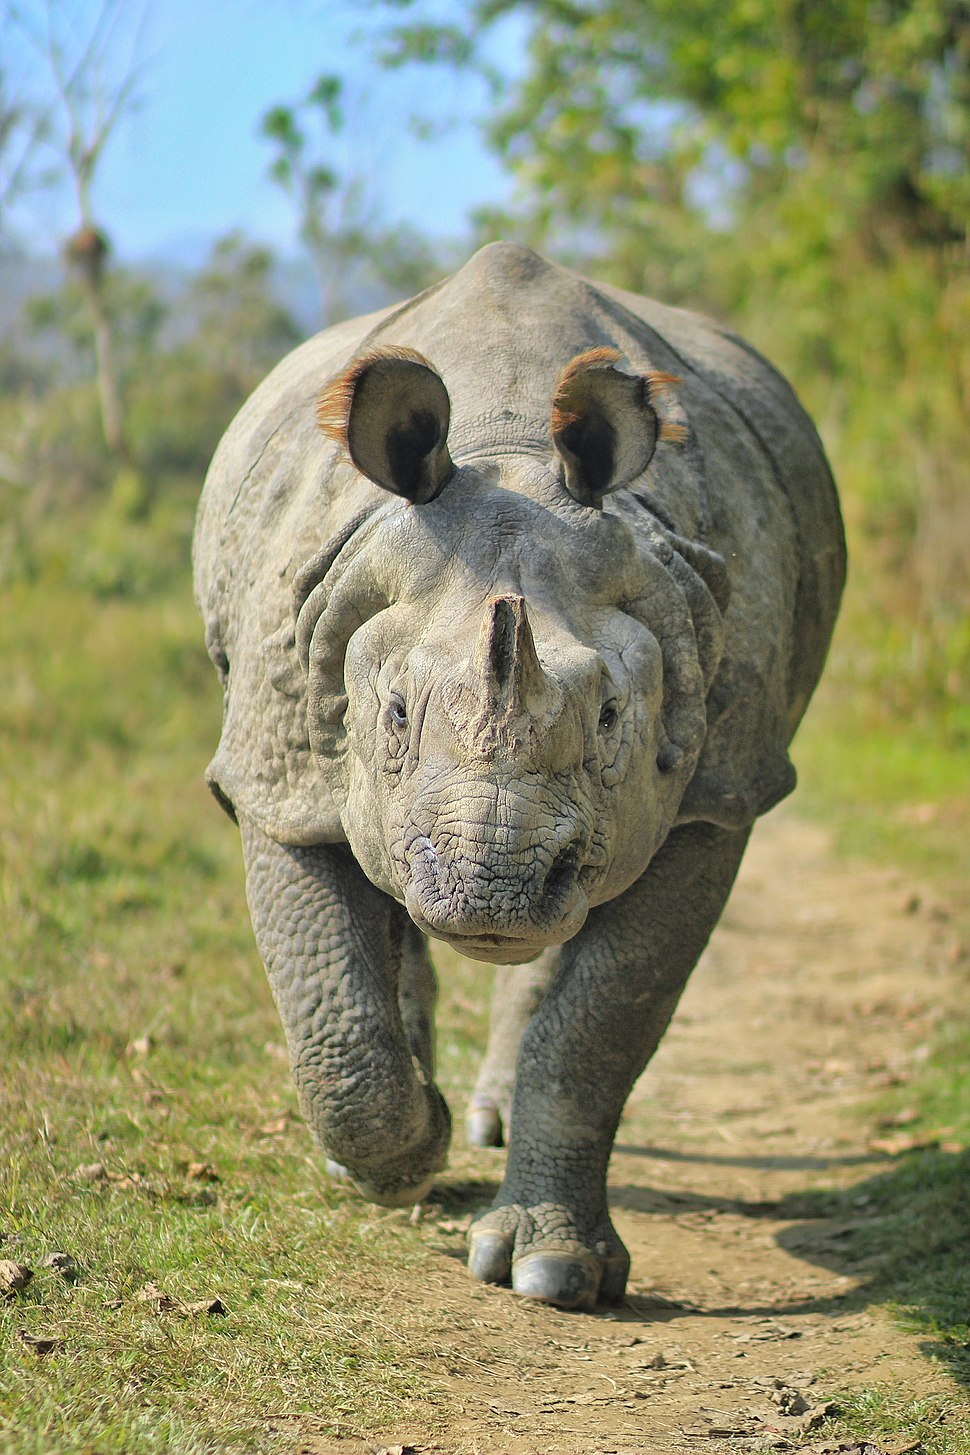 One-horned Rhinoceros at Chitwan National Park